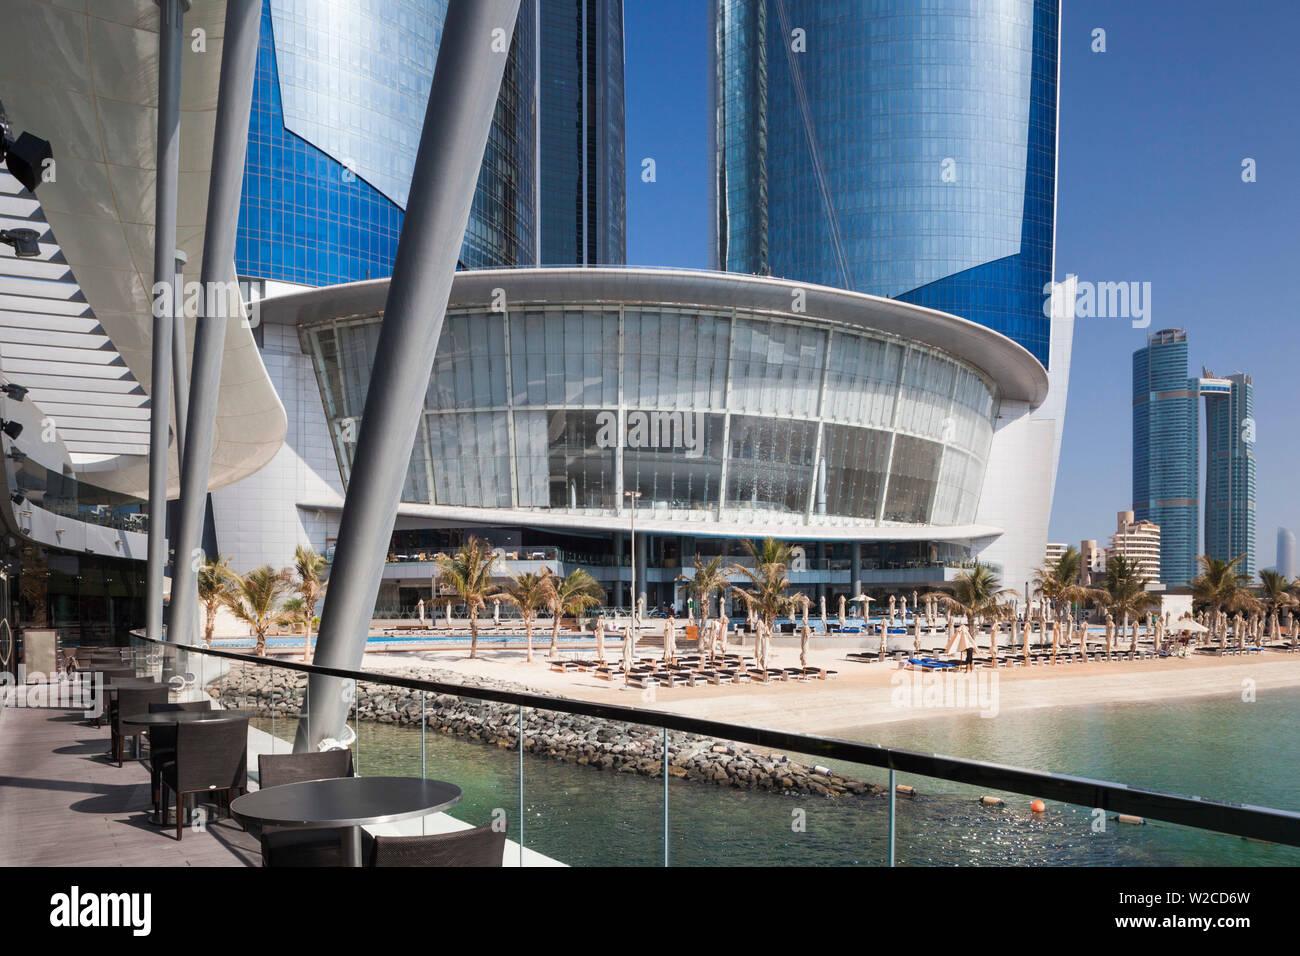 UAE, Abu Dhabi, Jumeirah at Etihad Towers Hotel, beach - Stock Image